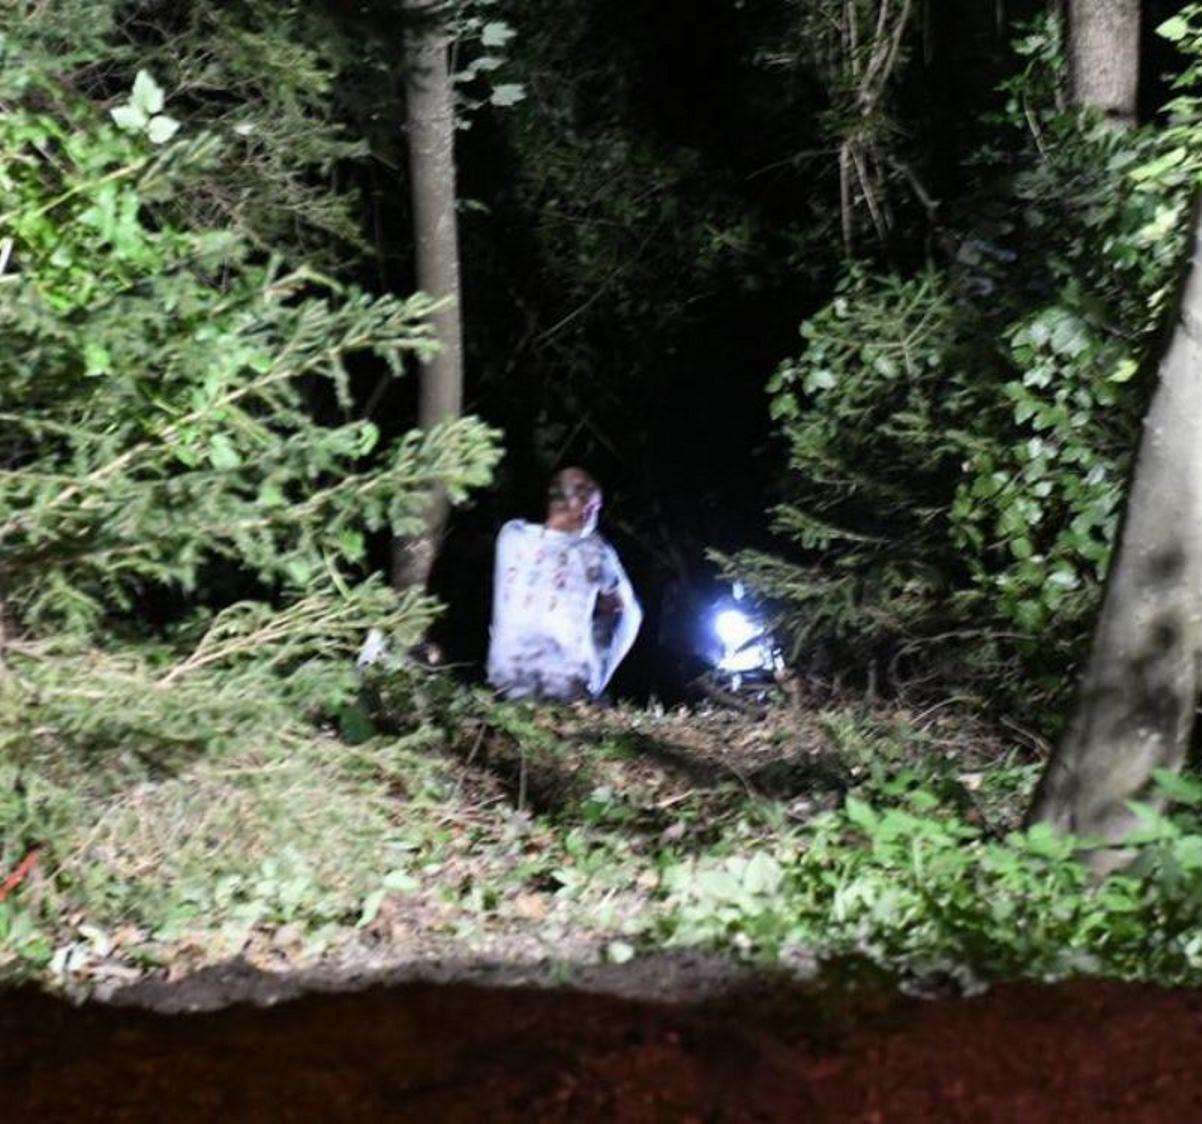 incidente moto pergine valsugana morti papà figlia